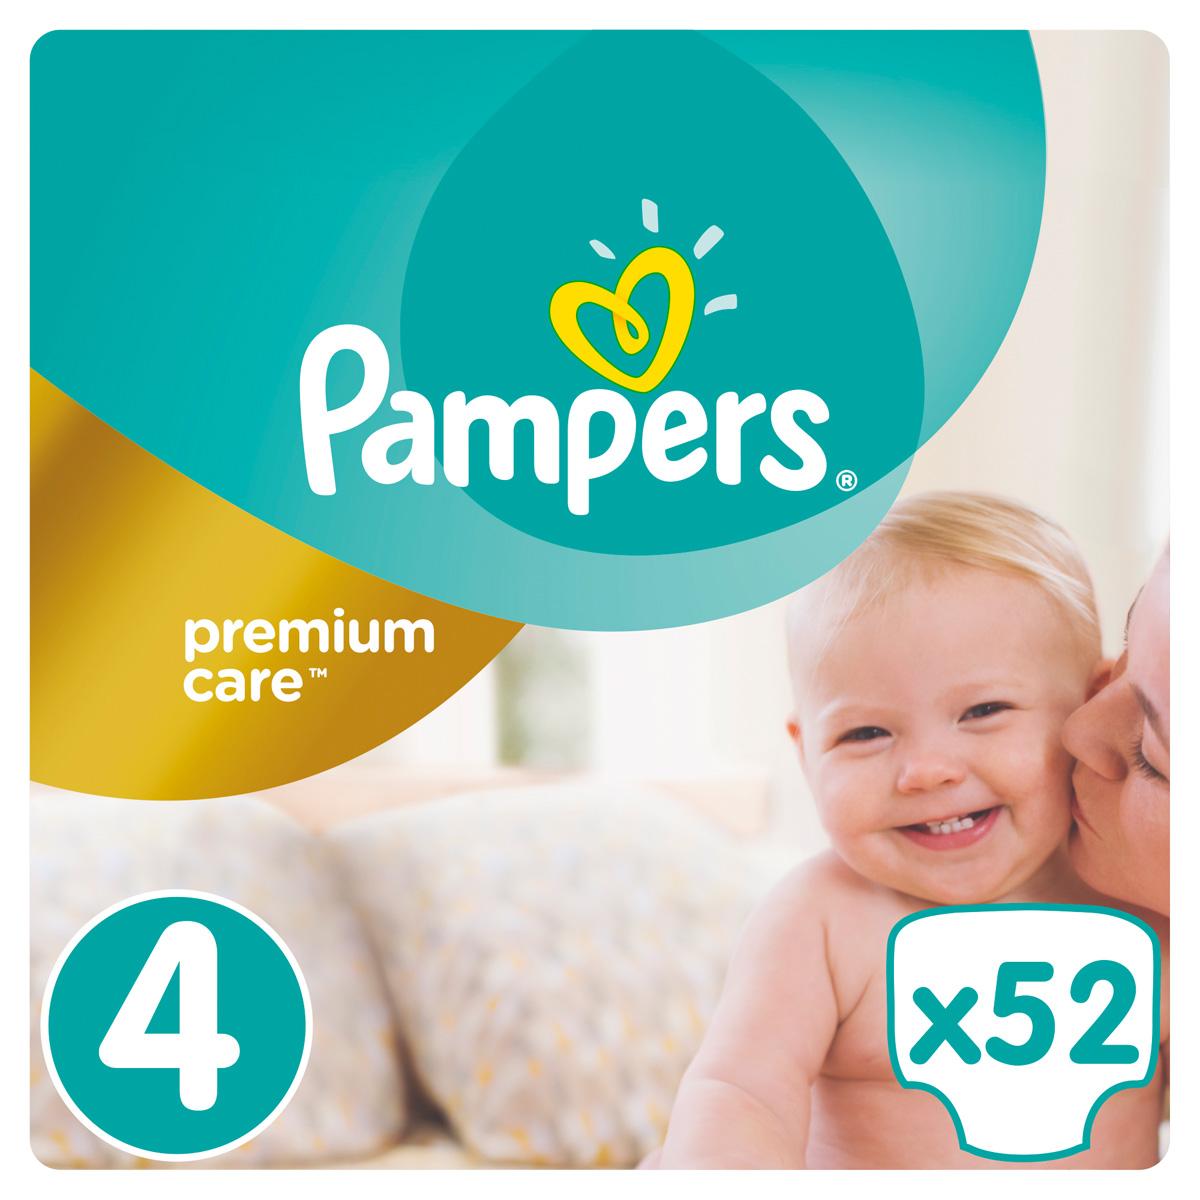 Pampers Premium Care Подгузники 4, 7-18 кг, 52 шт